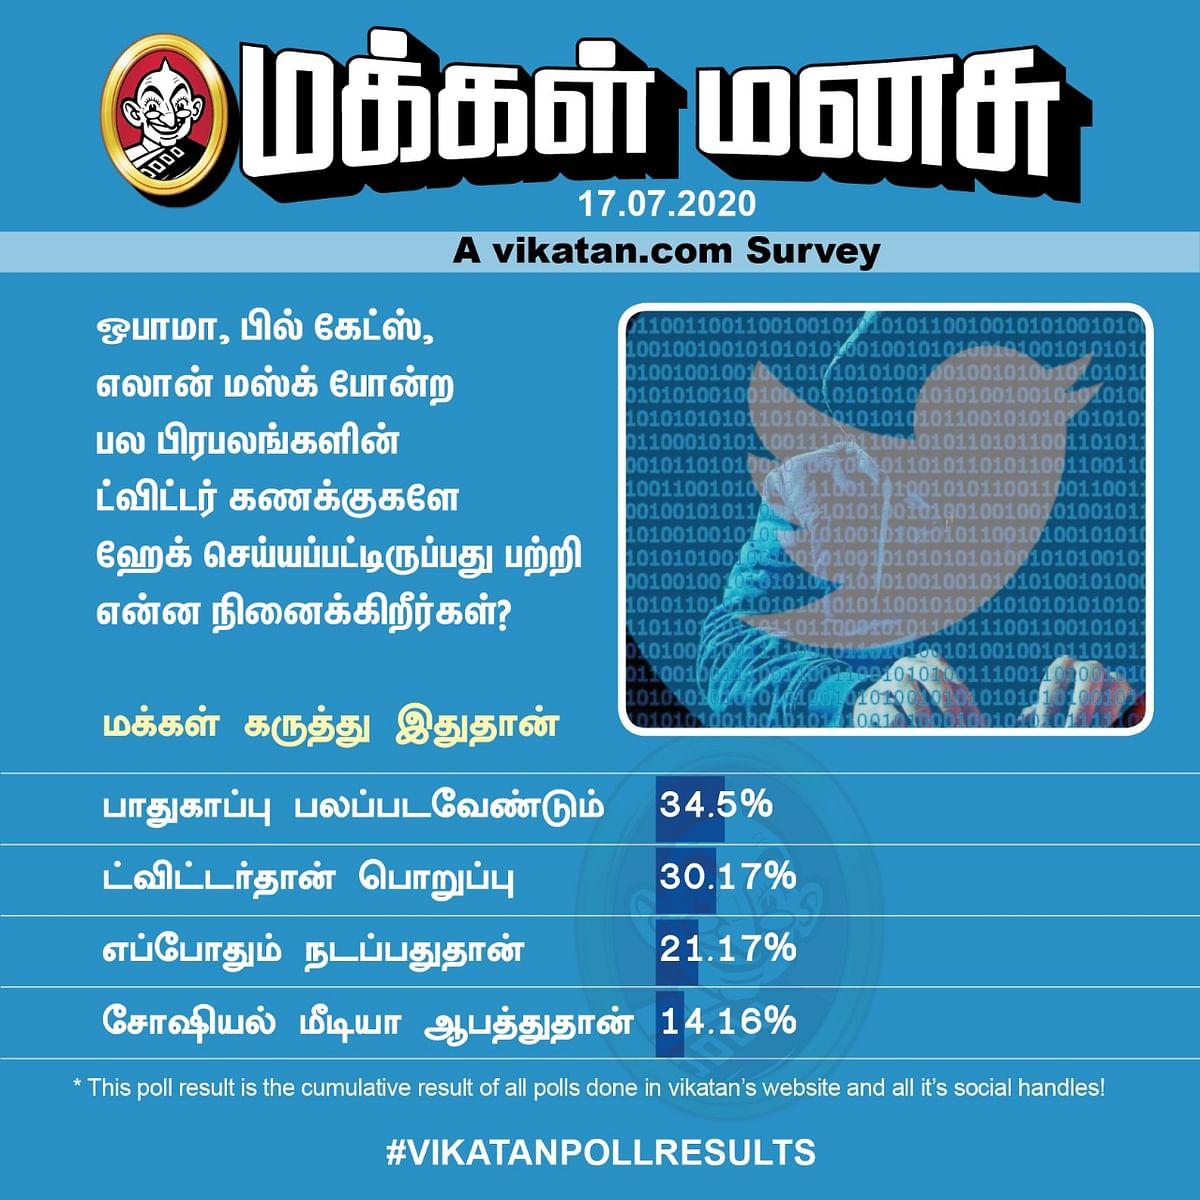 Twitter Hacked | Vikatan Poll